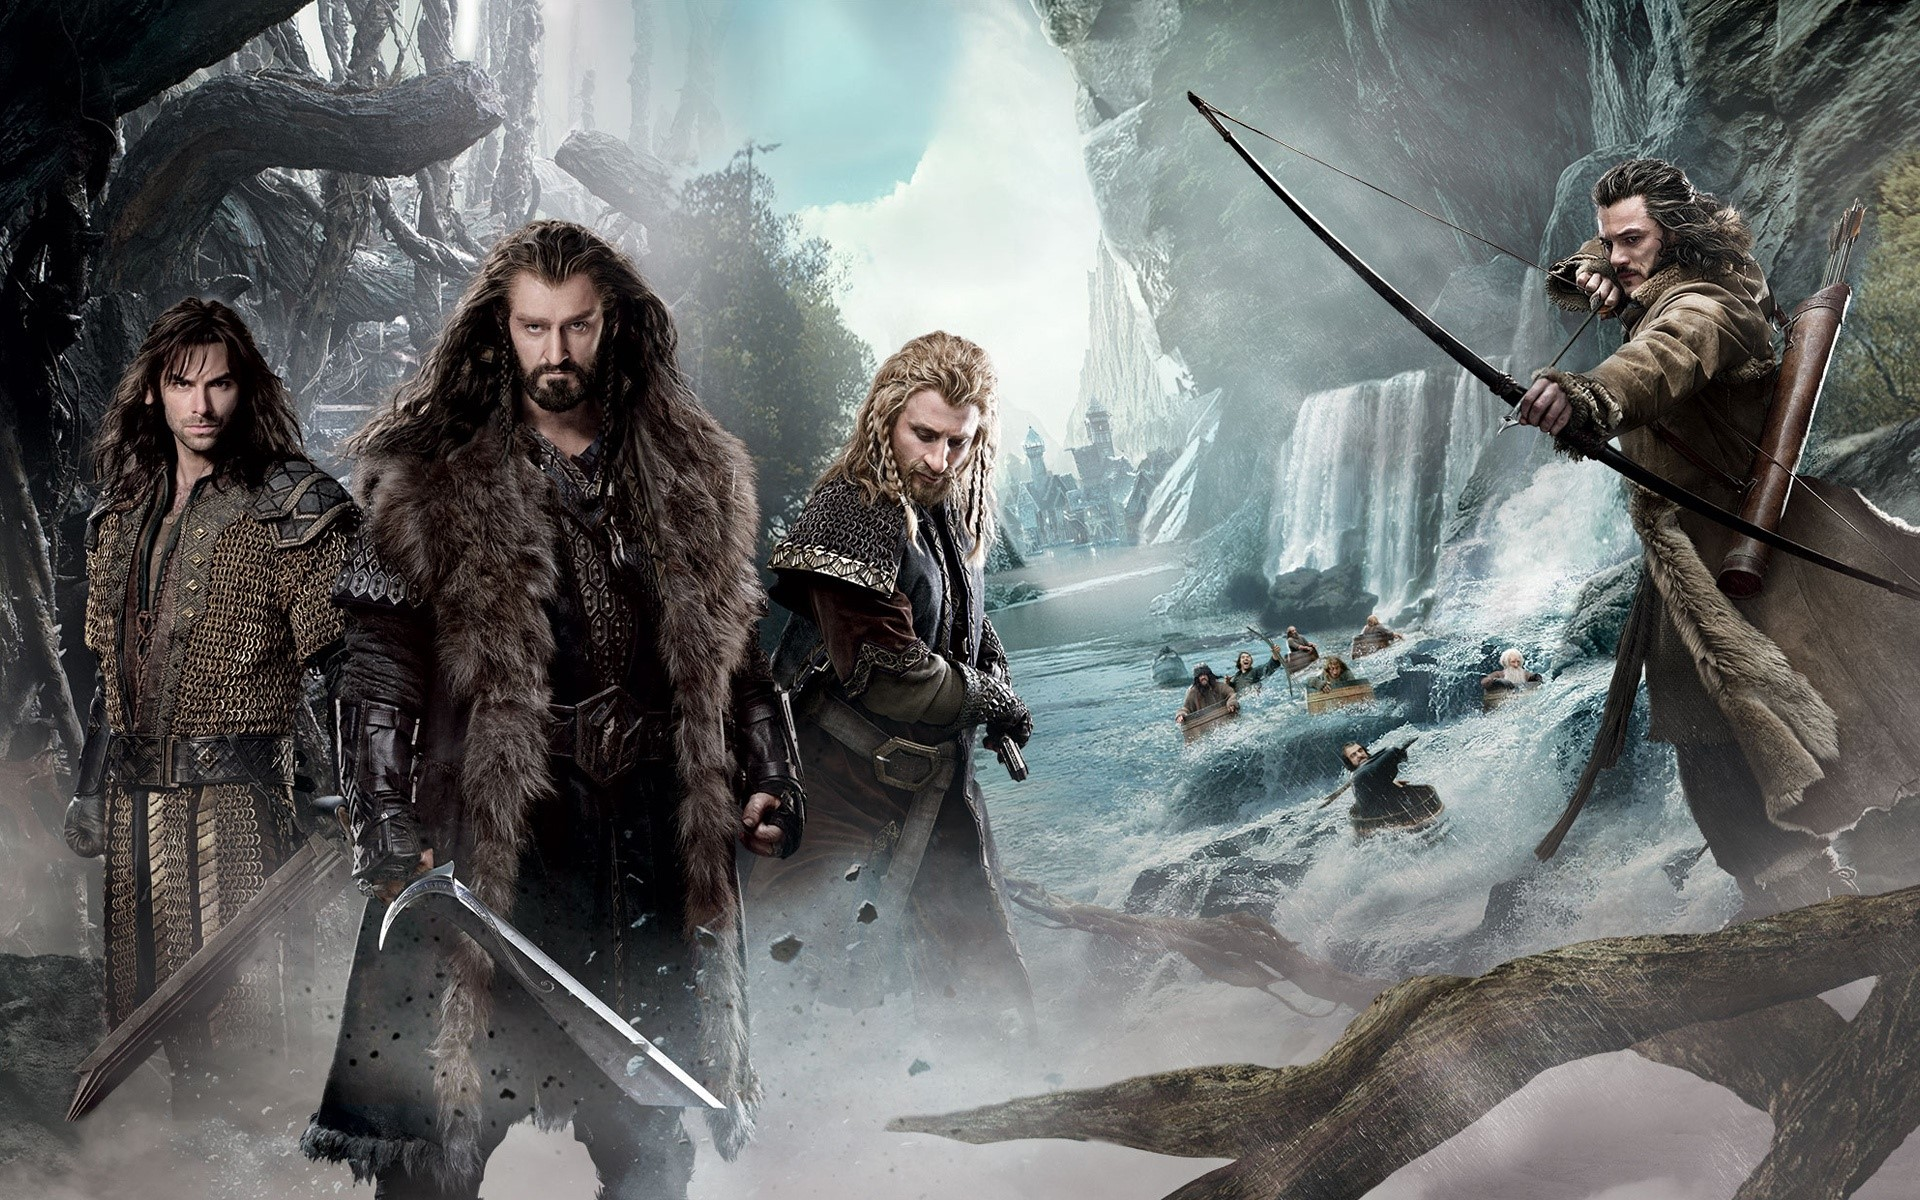 Fondo de pantalla de The hobbit 2 Imágenes